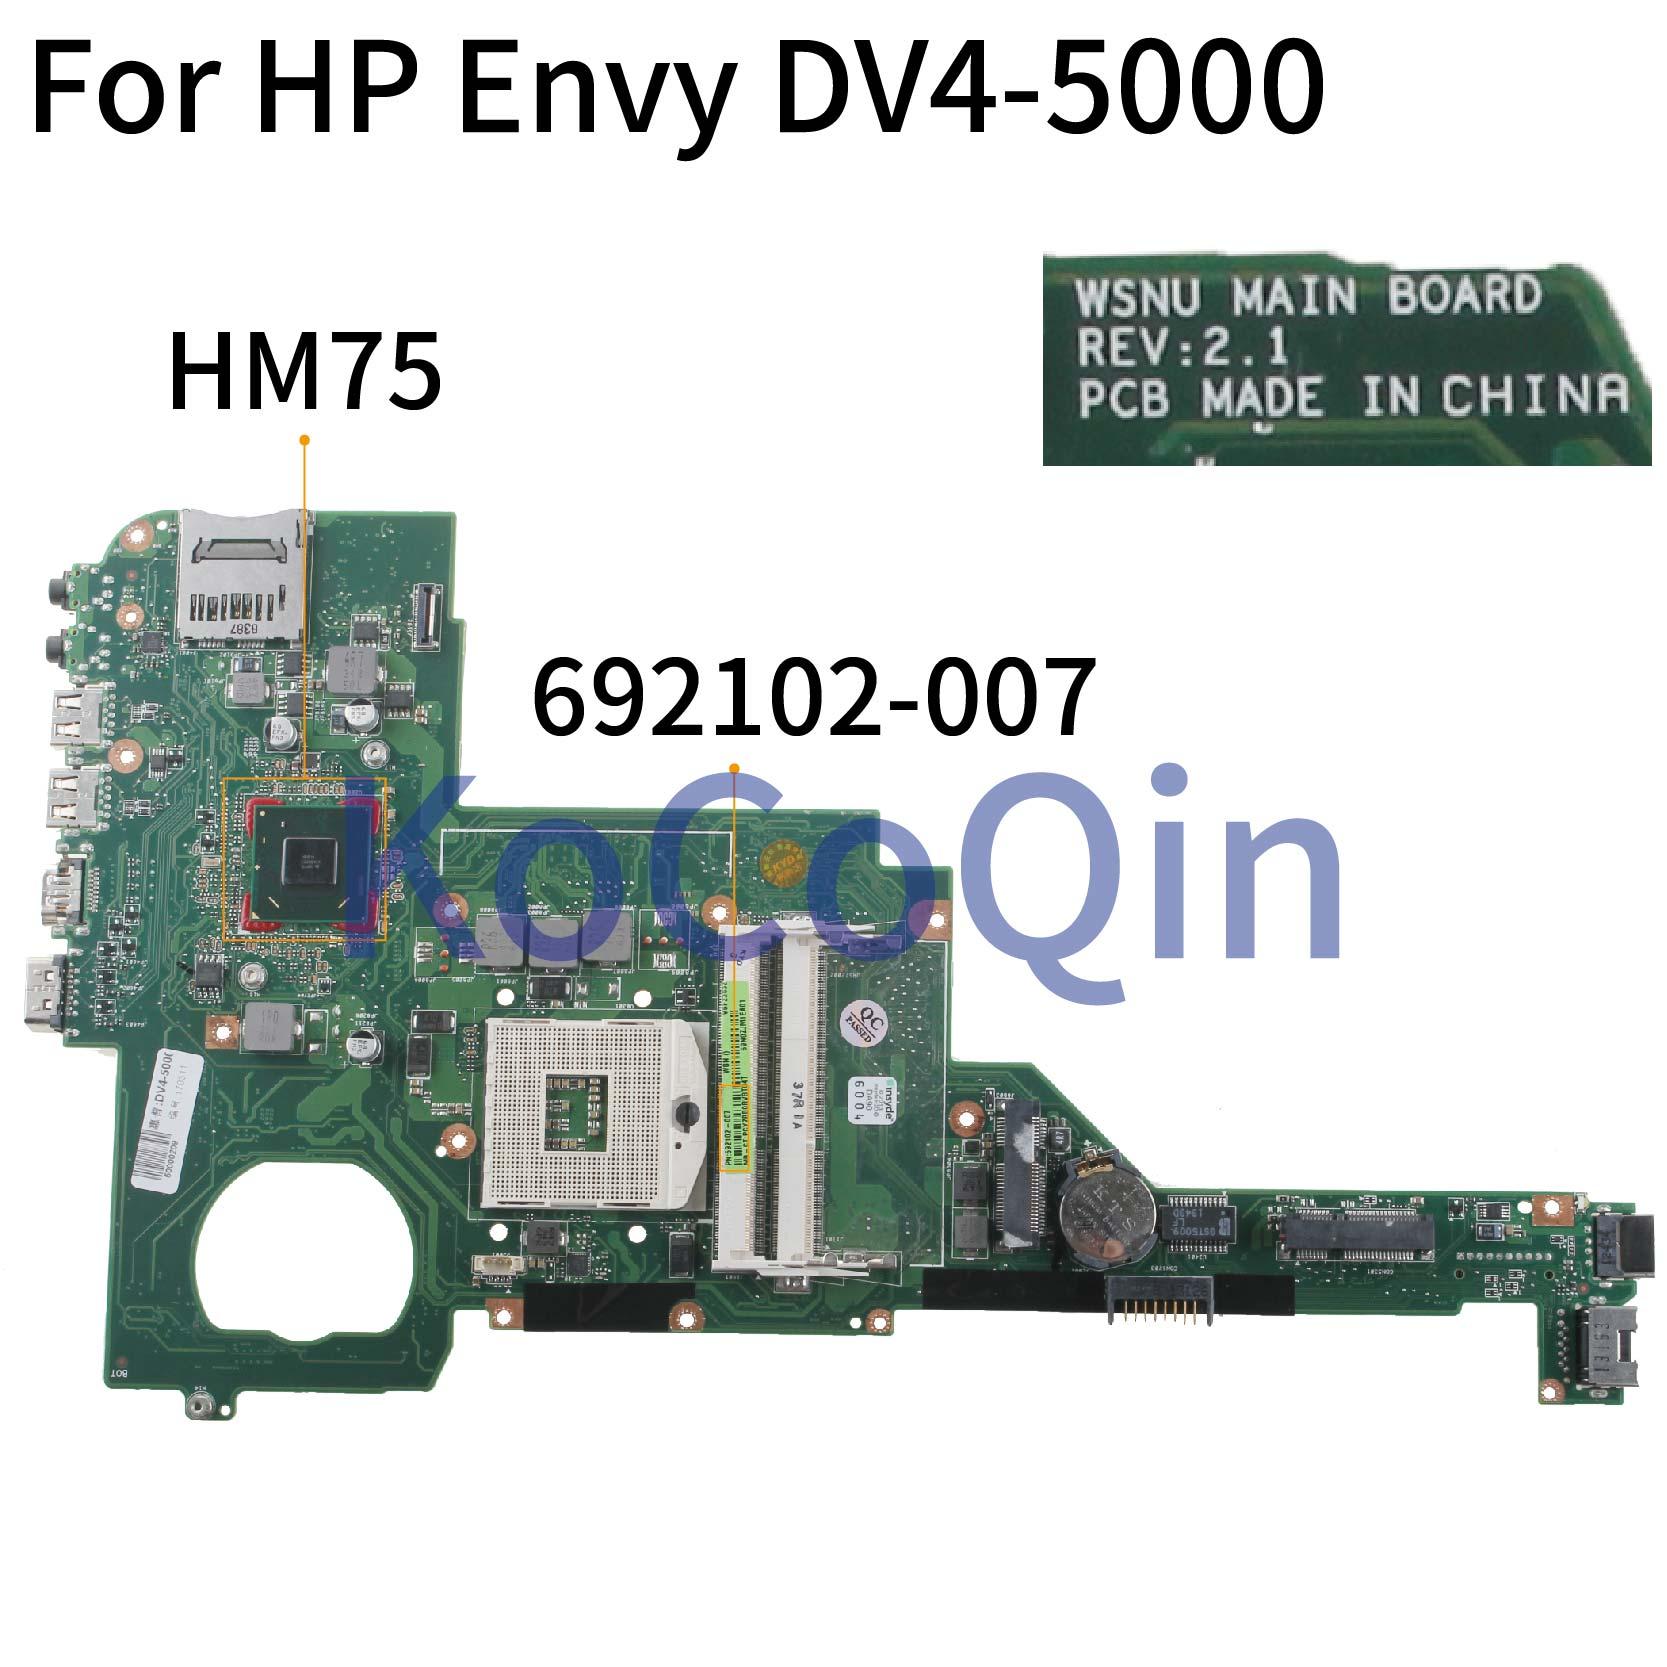 KoCoQin اللوحة لابتوب HP جناح DV4 DV4-5000 اللوحة 676756-501 676756-001 HM75